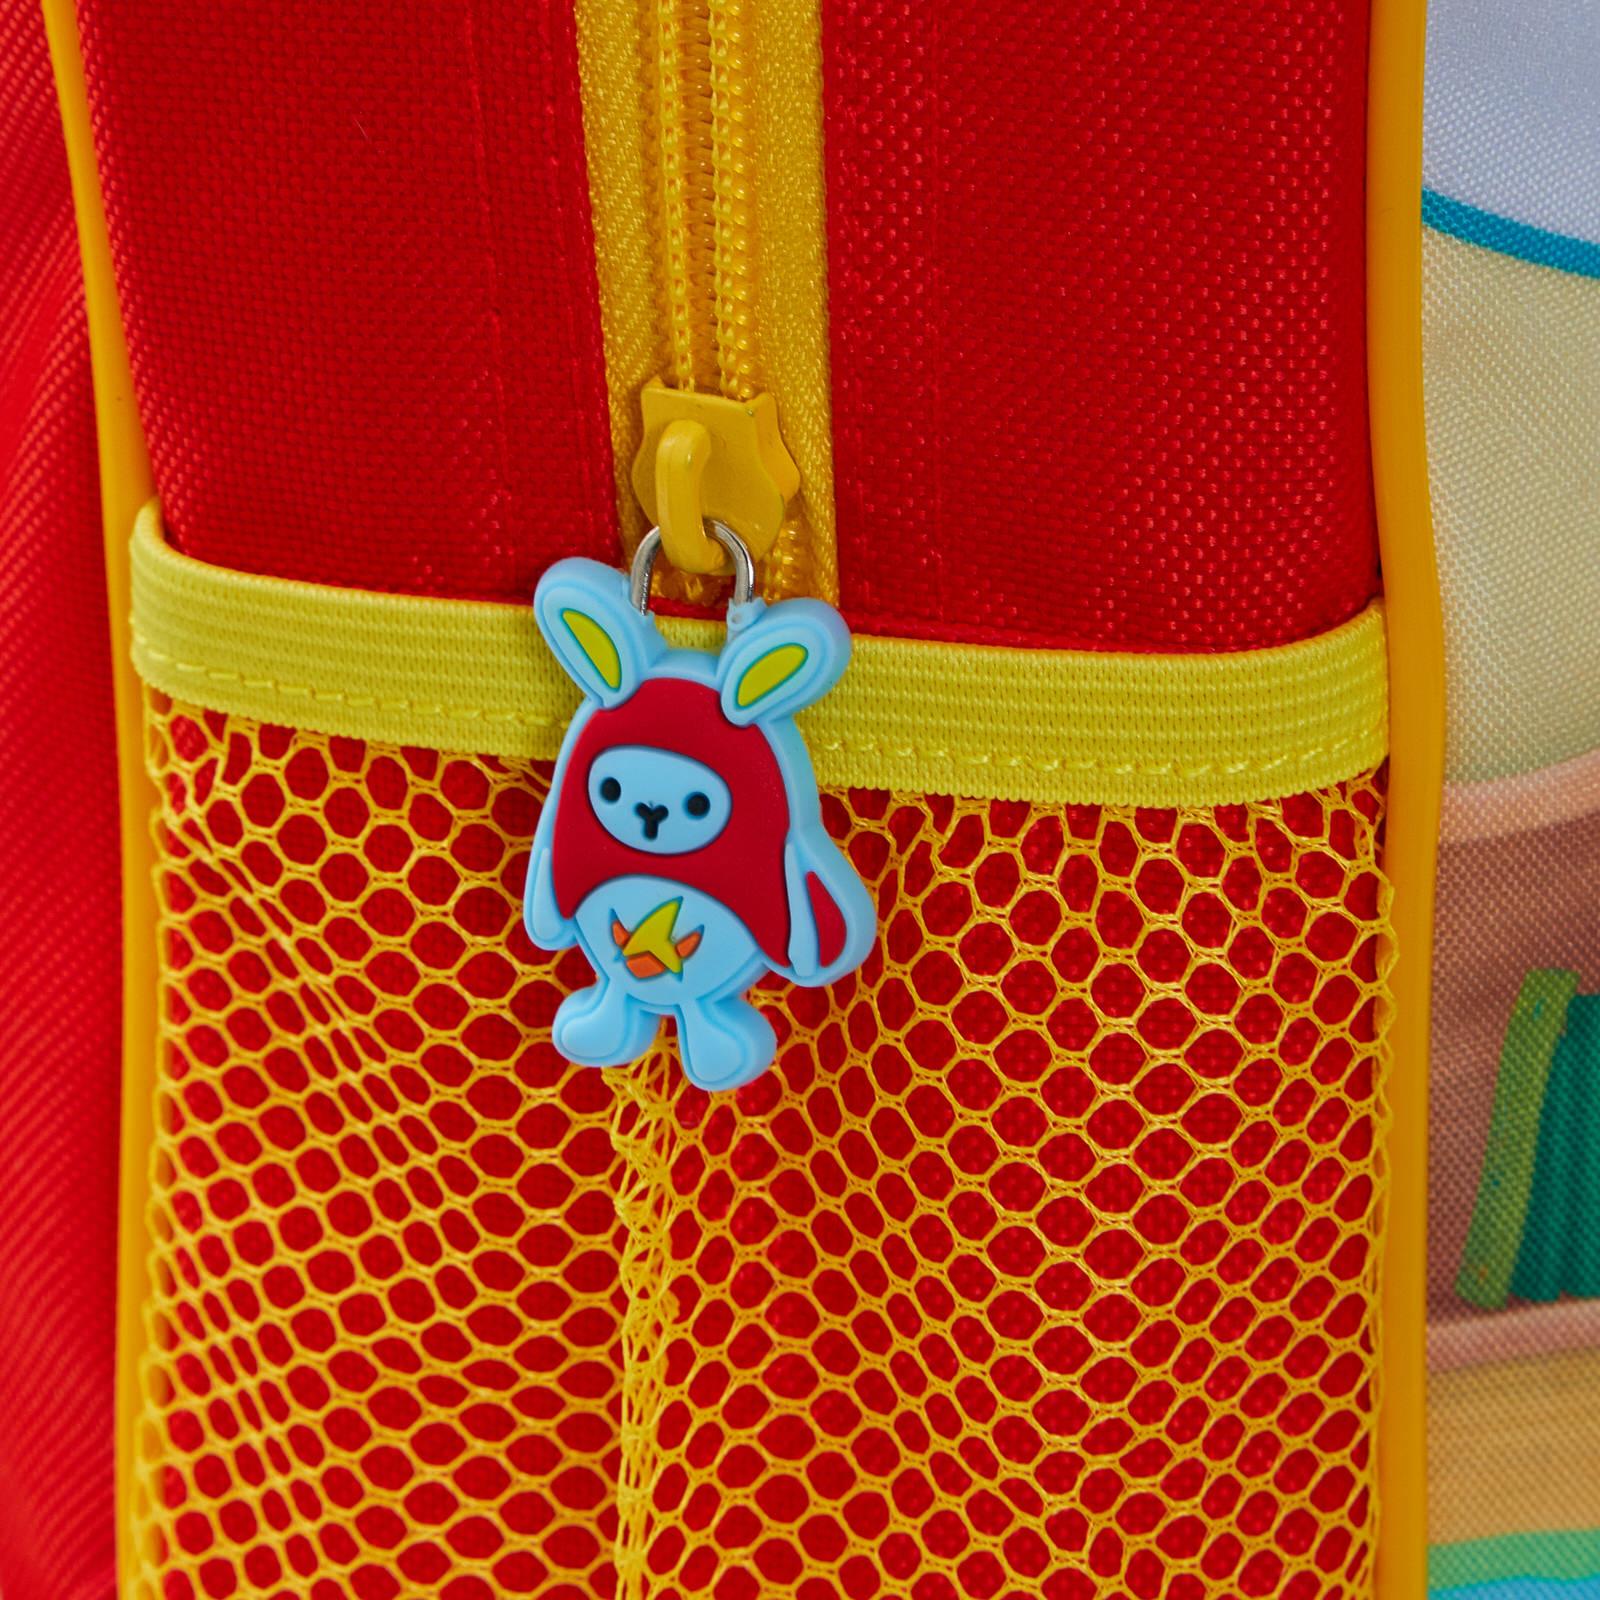 miniatuur 9 - Kids Bing Bunny 3D Plush Backpack Boys Girls Nursery School Rucksack Lunch Bag